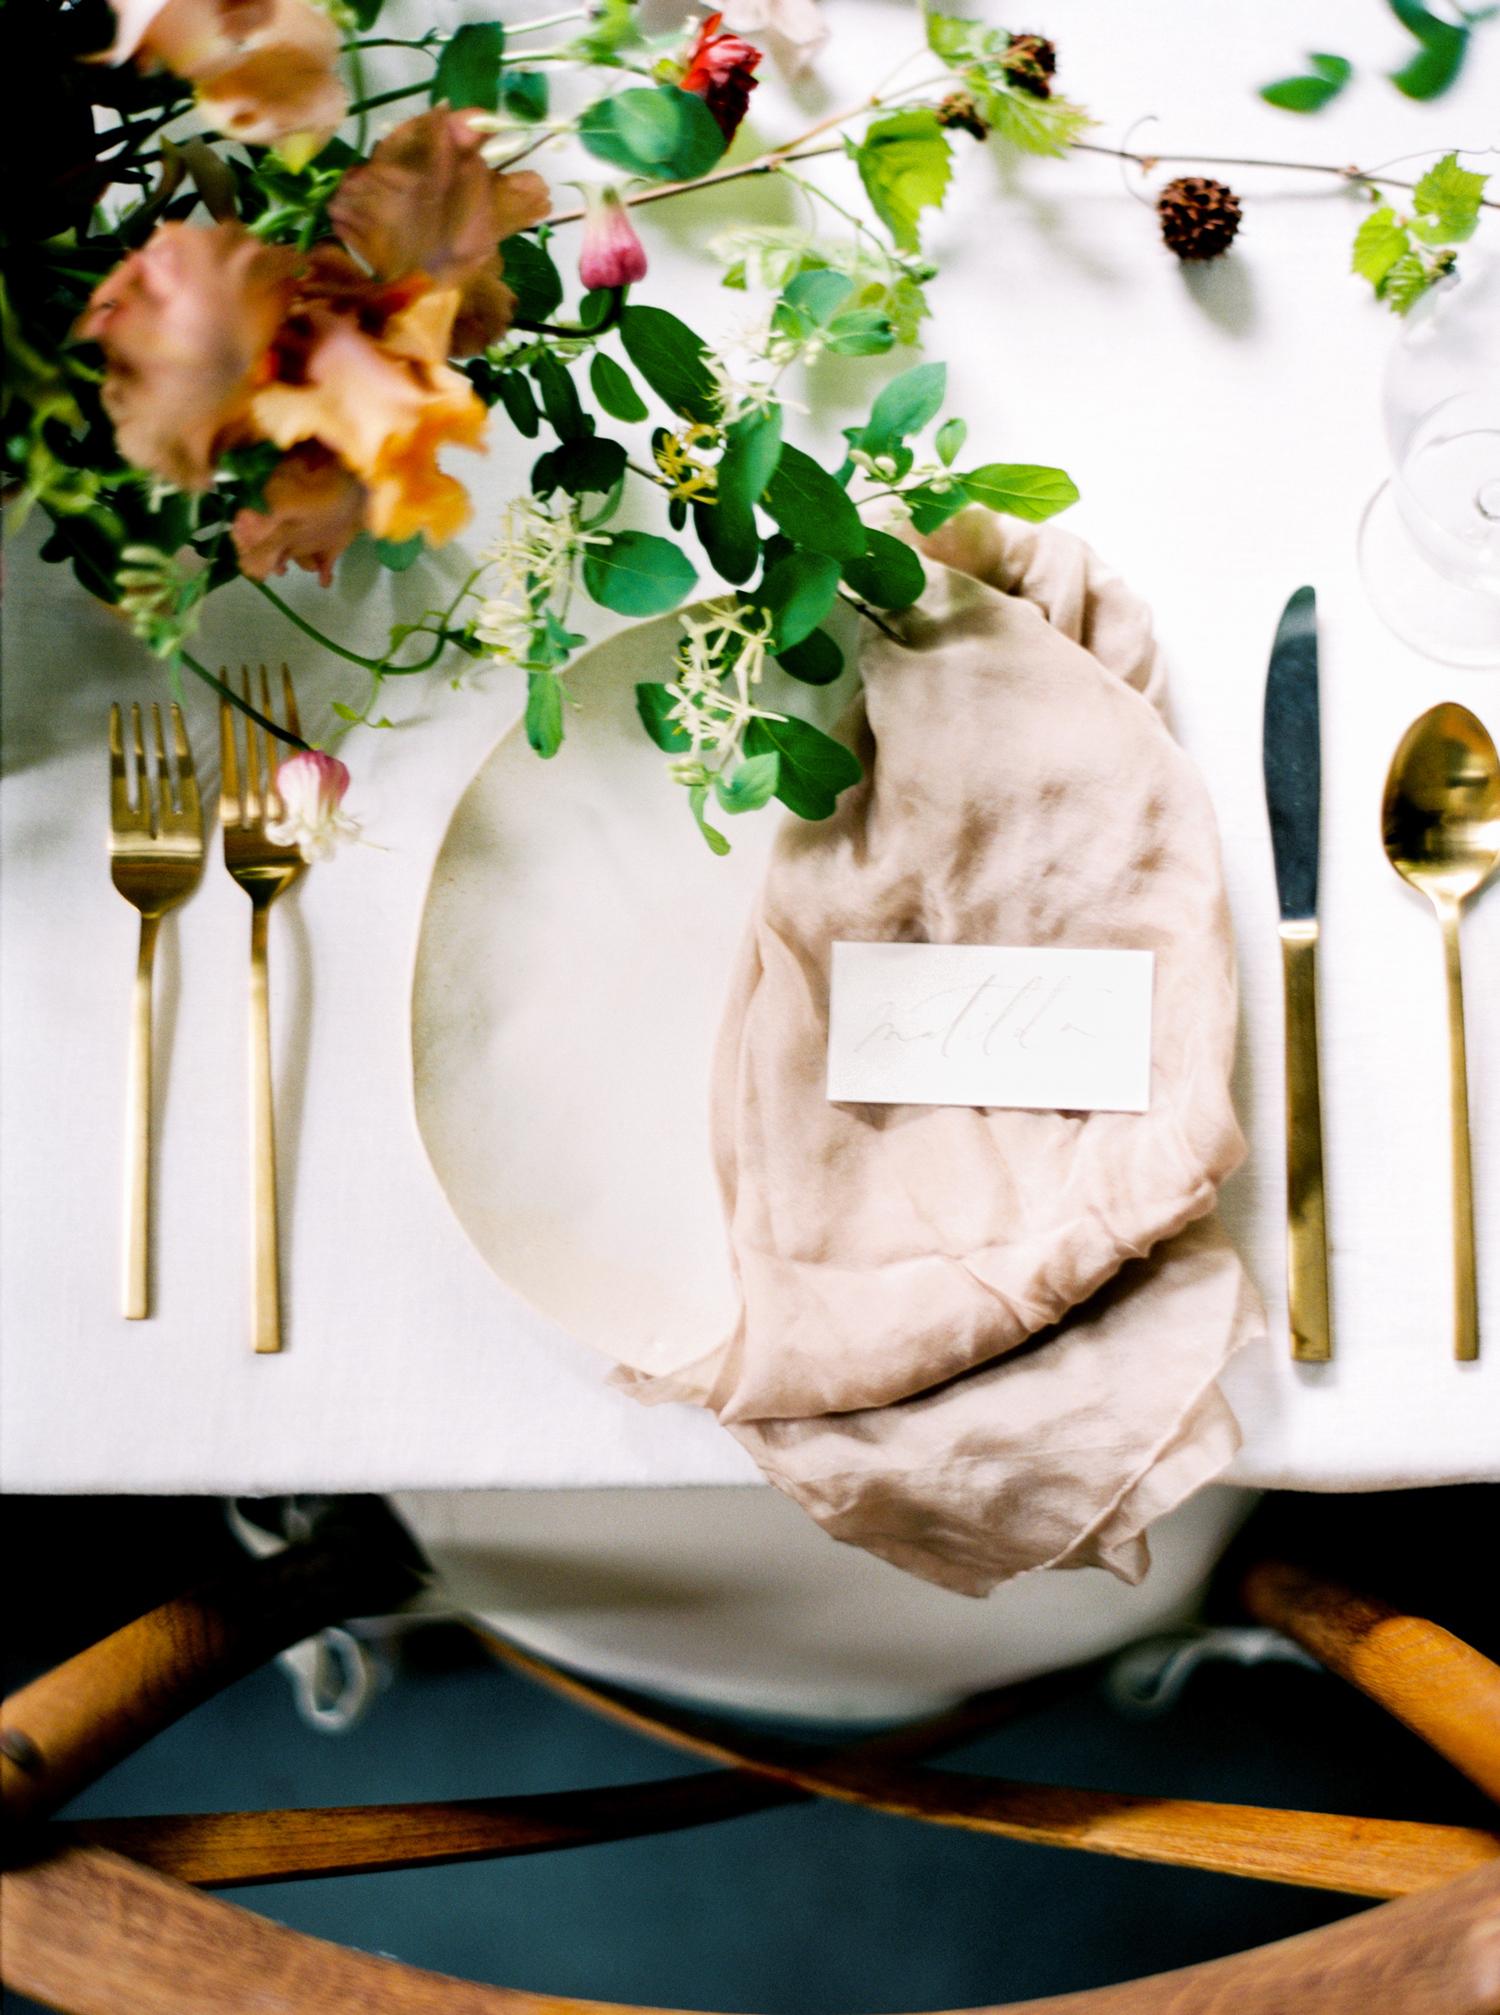 wedding reception napkin folds pink napkin draped on one half of plate